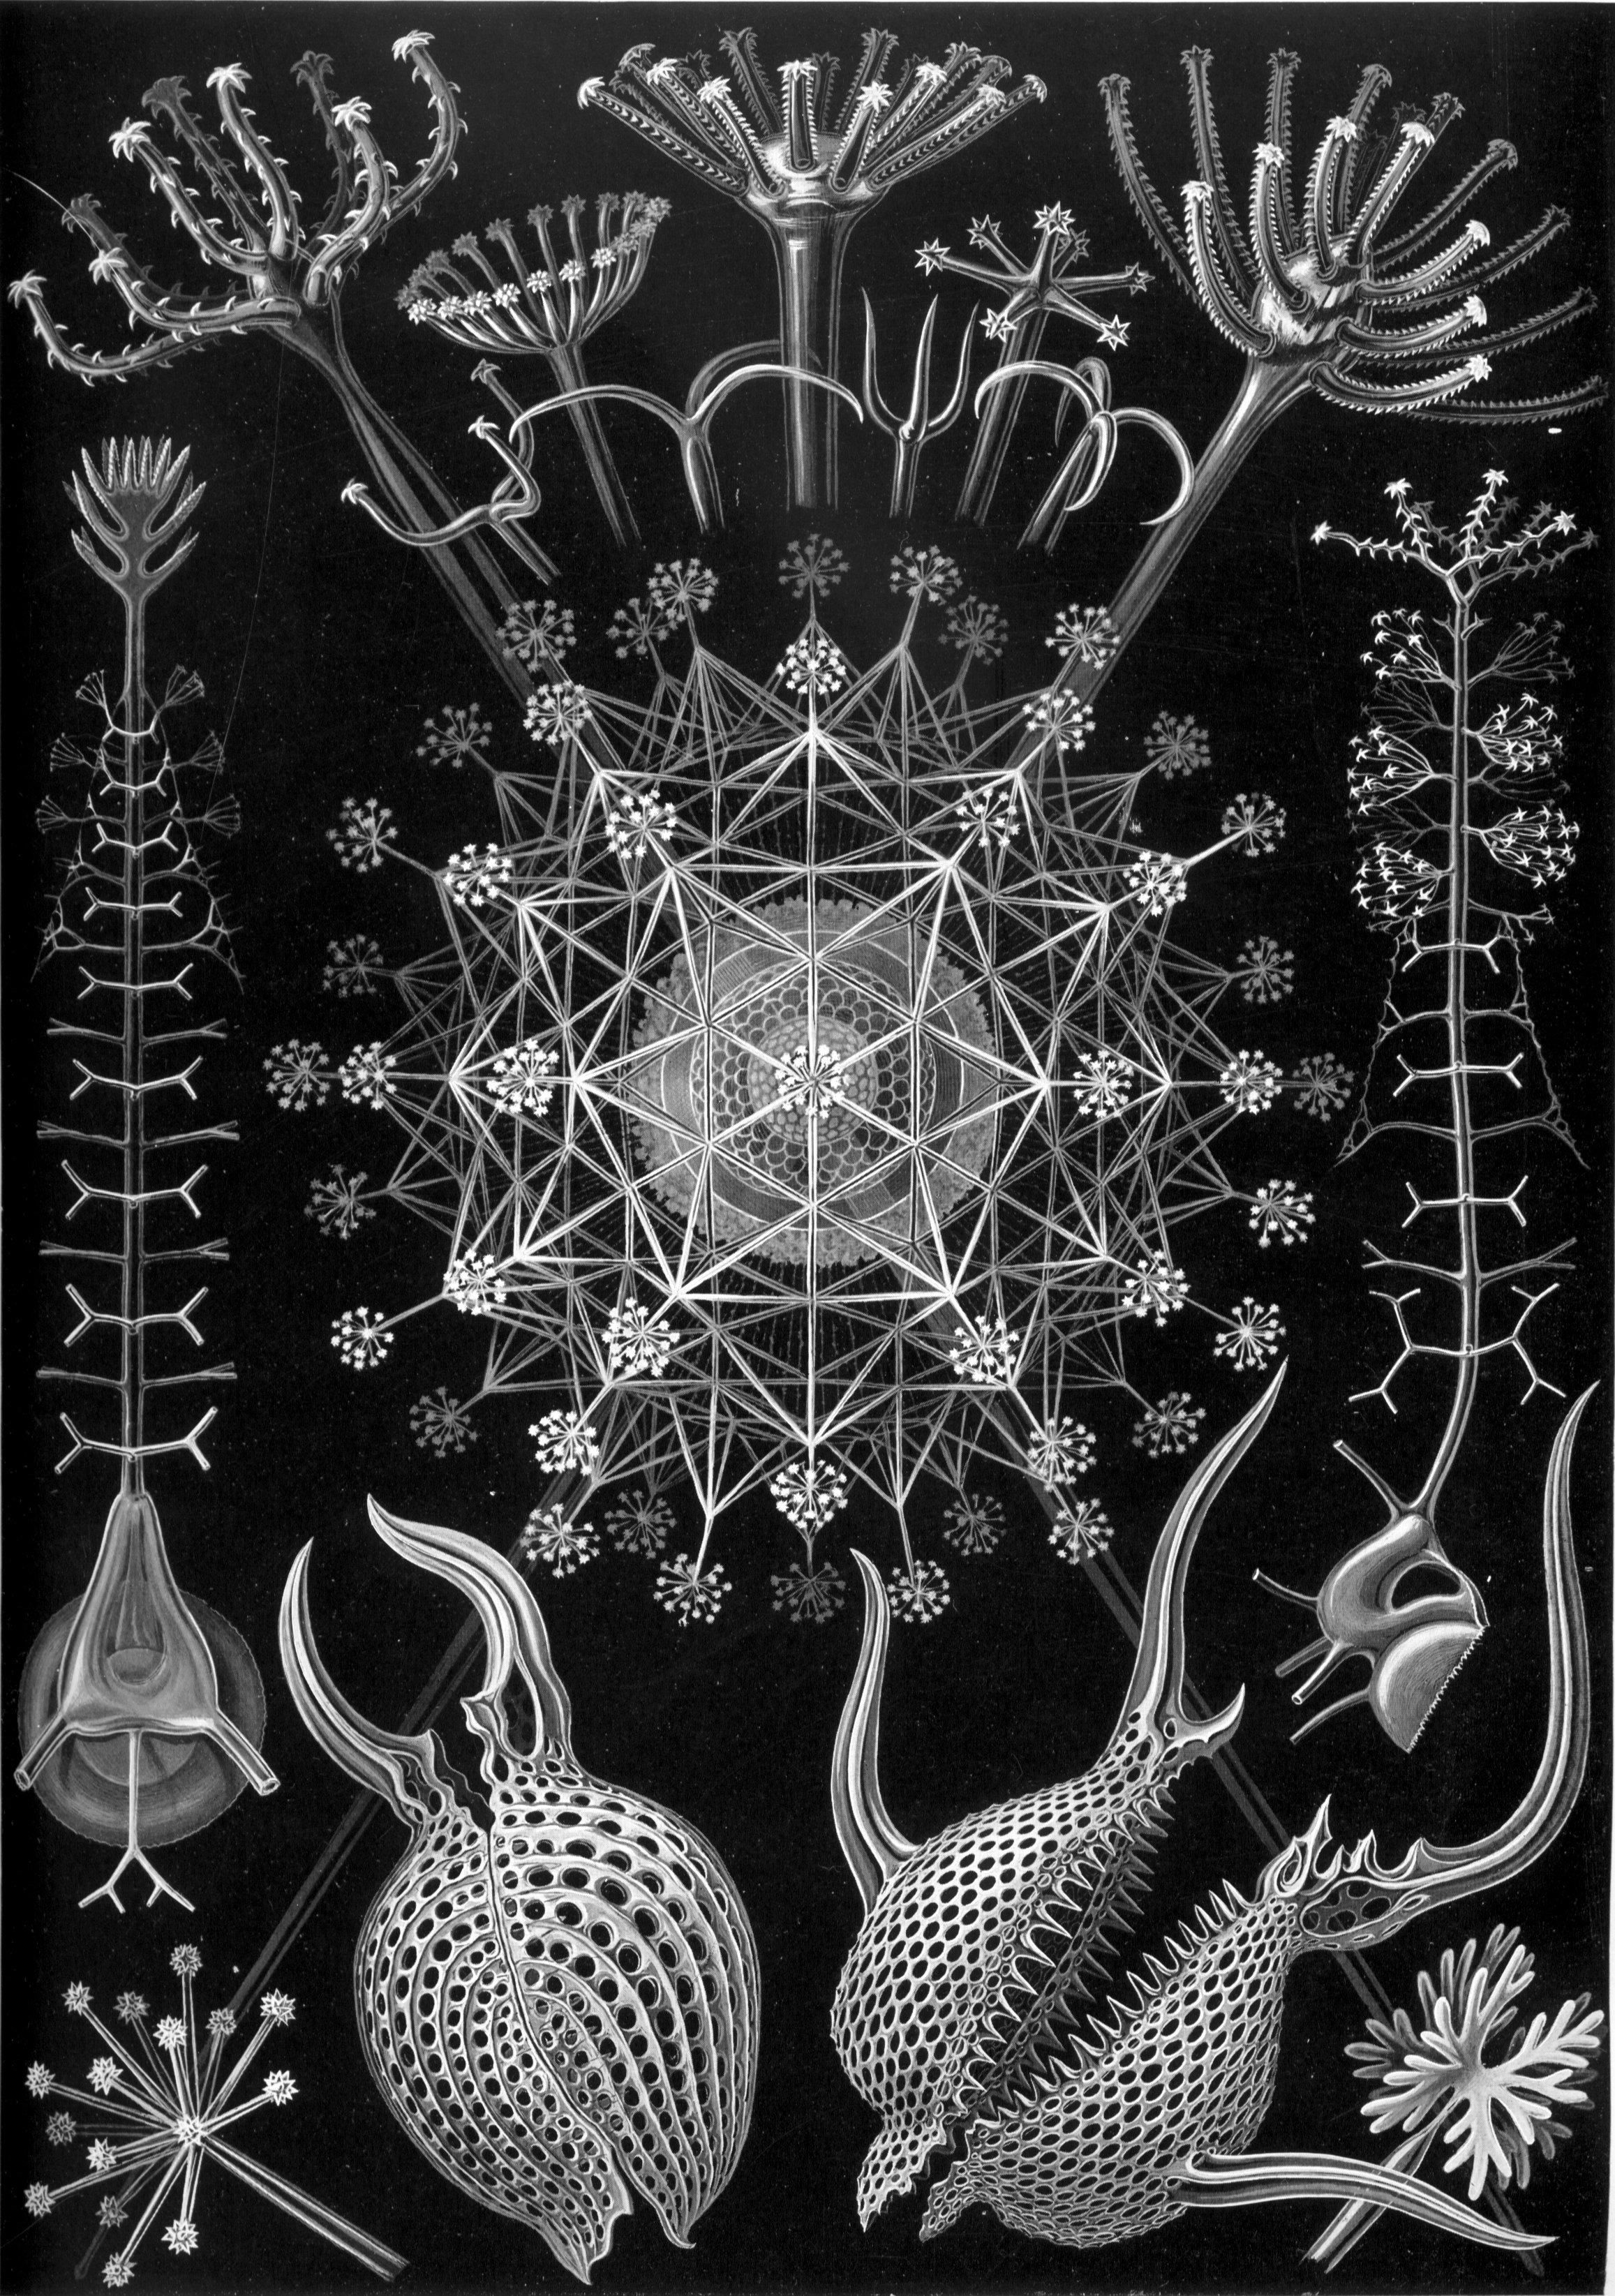 Haeckel Phaeodaria 61.jpg